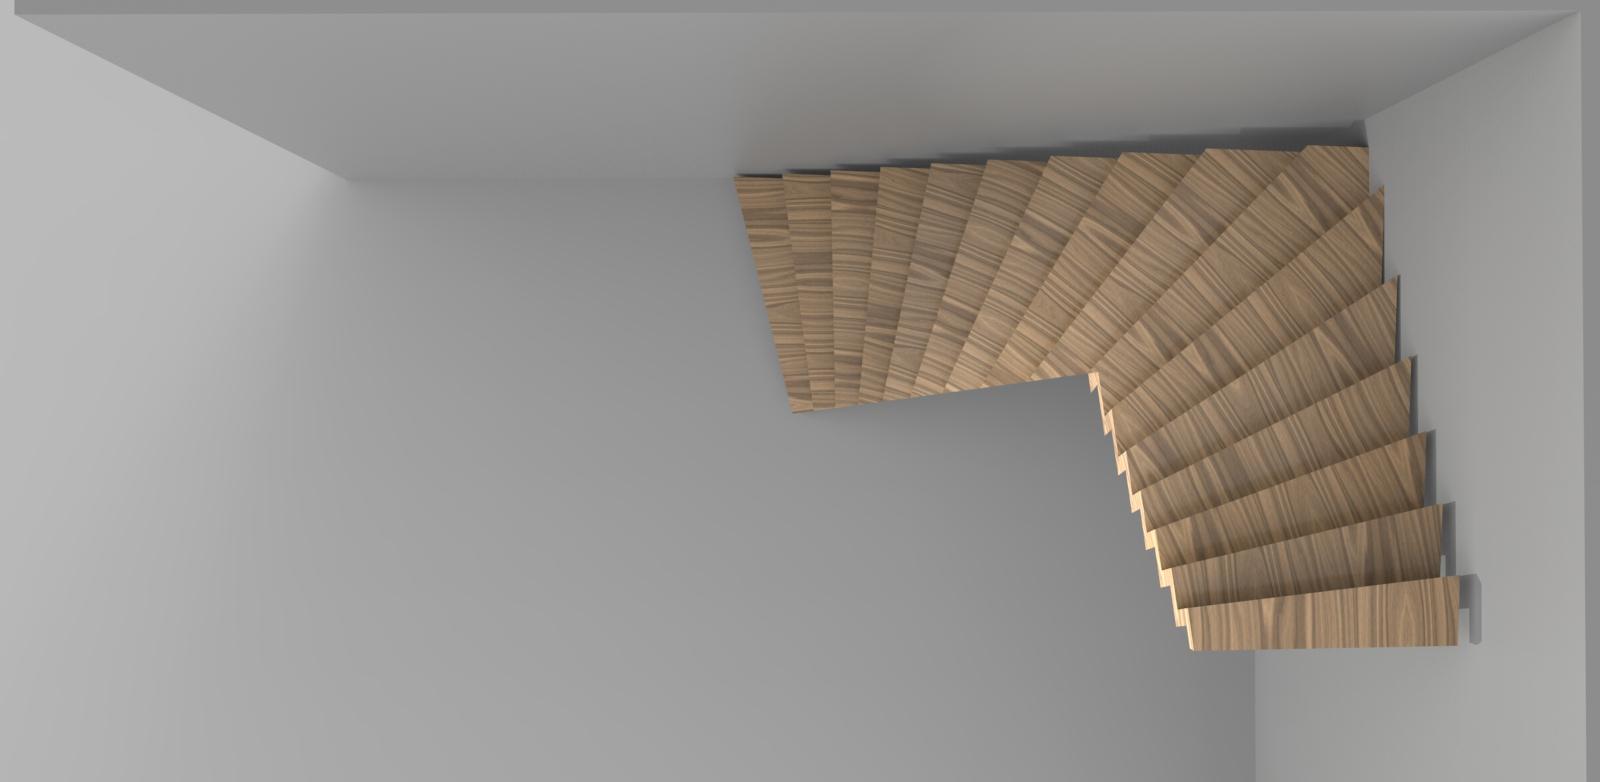 Ontwerp trap woonhuis rotterdam meubelmakerij breda - Ontwerp trap trap ...